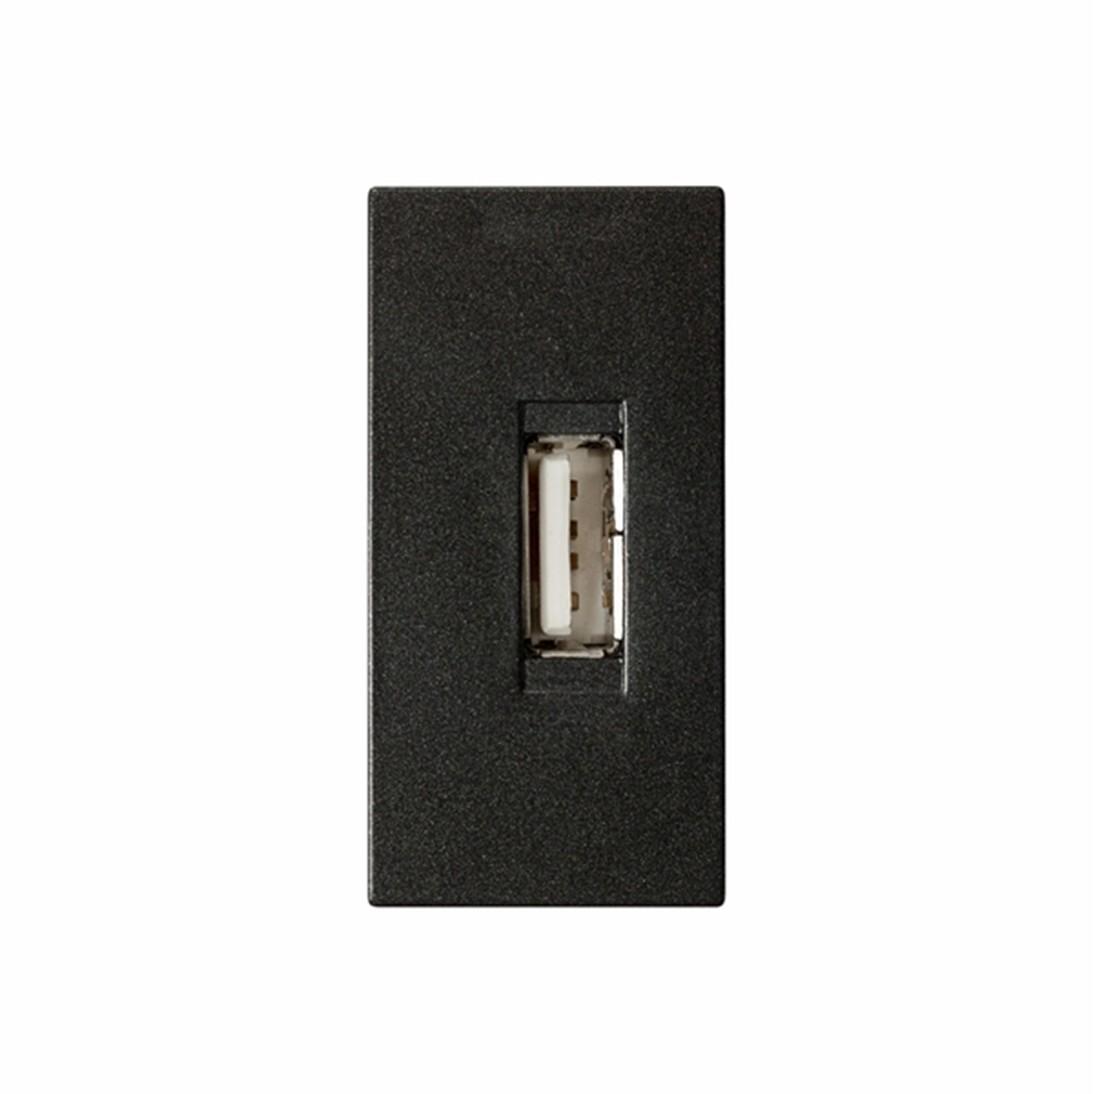 Modulo de Tomada para Carregador USB 5TG99353 Carbono Vivace Bivolt - Iriel